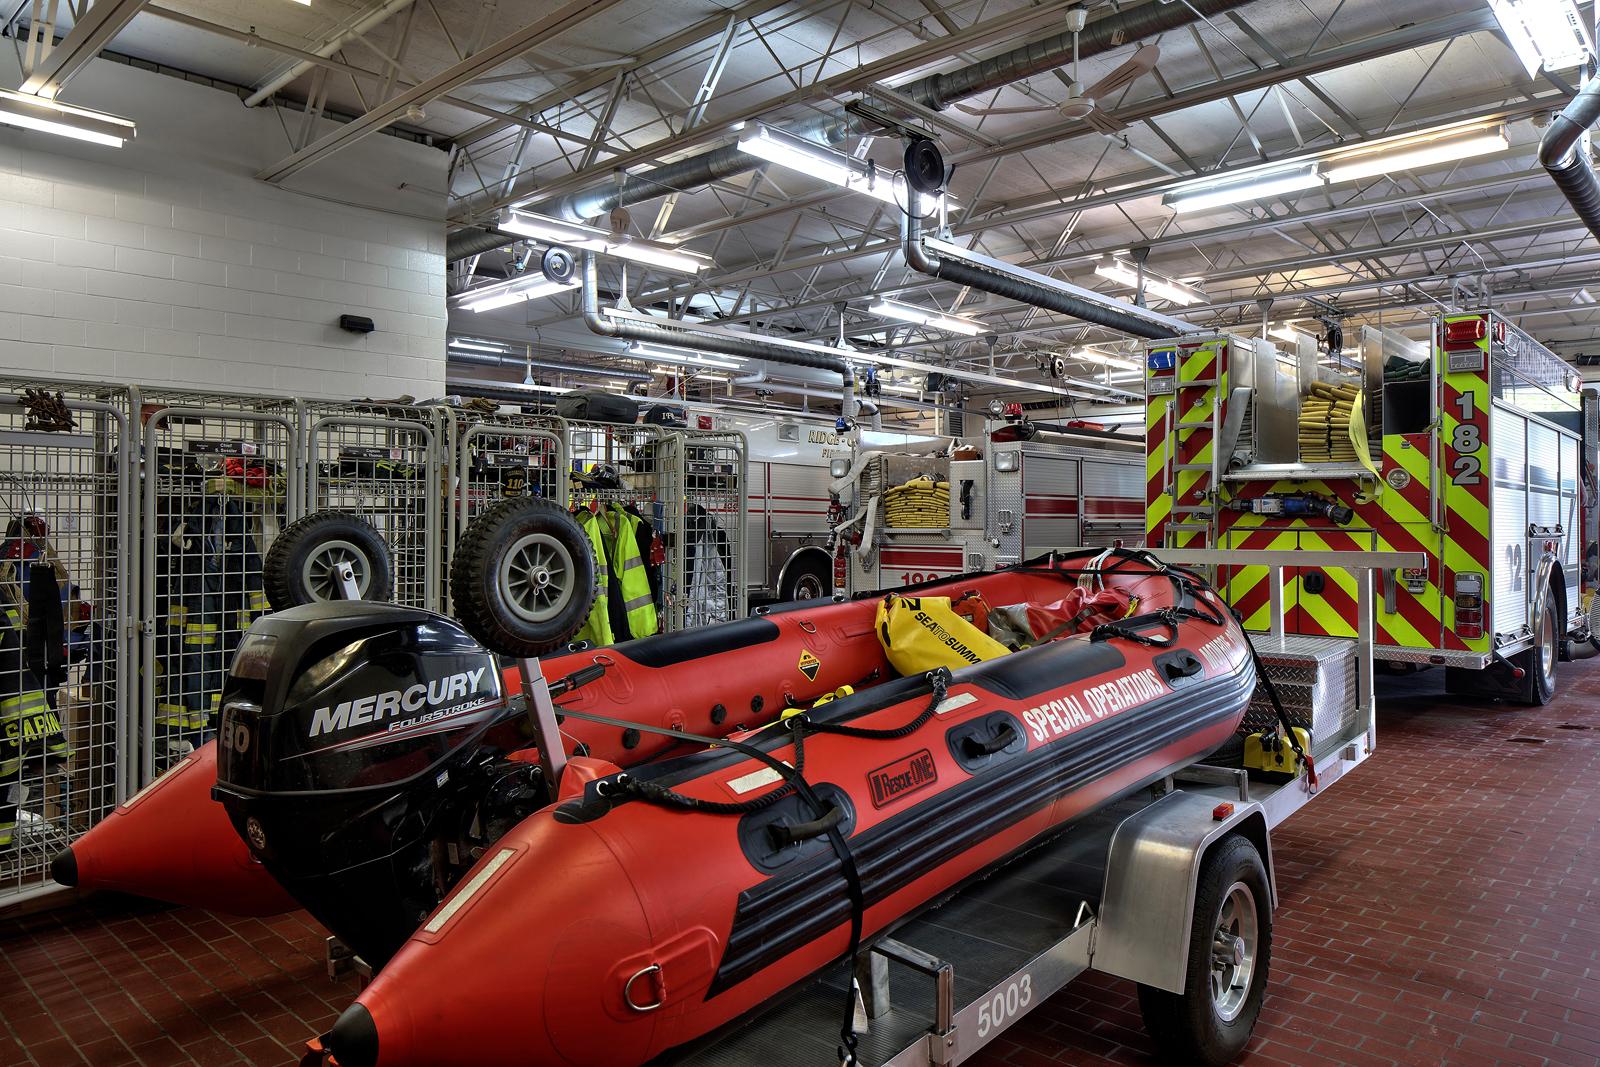 ridge-culver-fs-rescue-boat.jpg